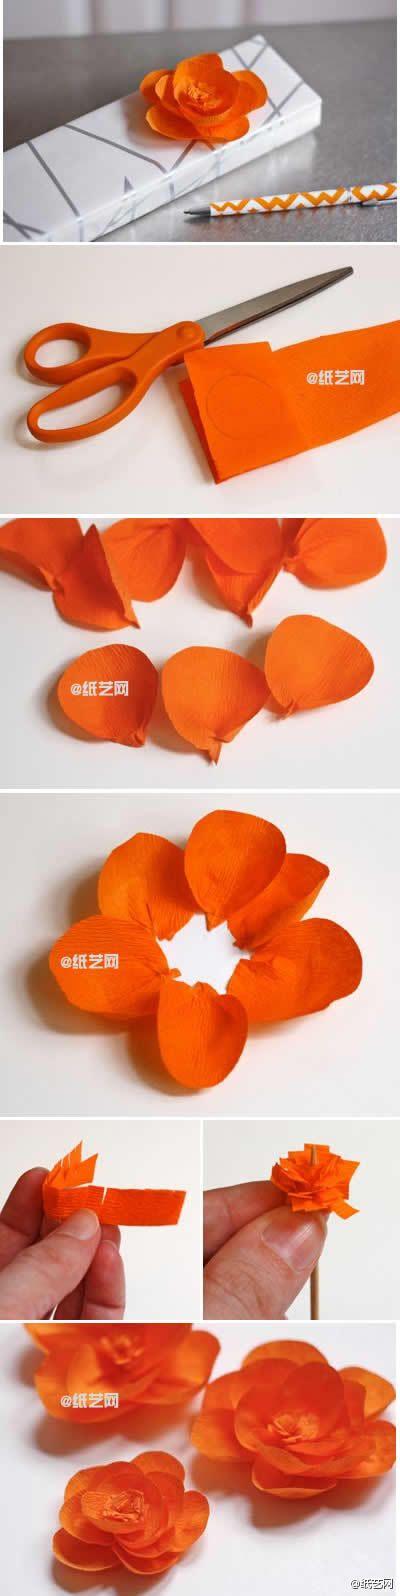 crepe paper flowers: Diy Flowers, Gift, Paperflowers, Paper, Paper Flowers, Diy Craft, Pretty Flower, Craft Ideas, Crafts